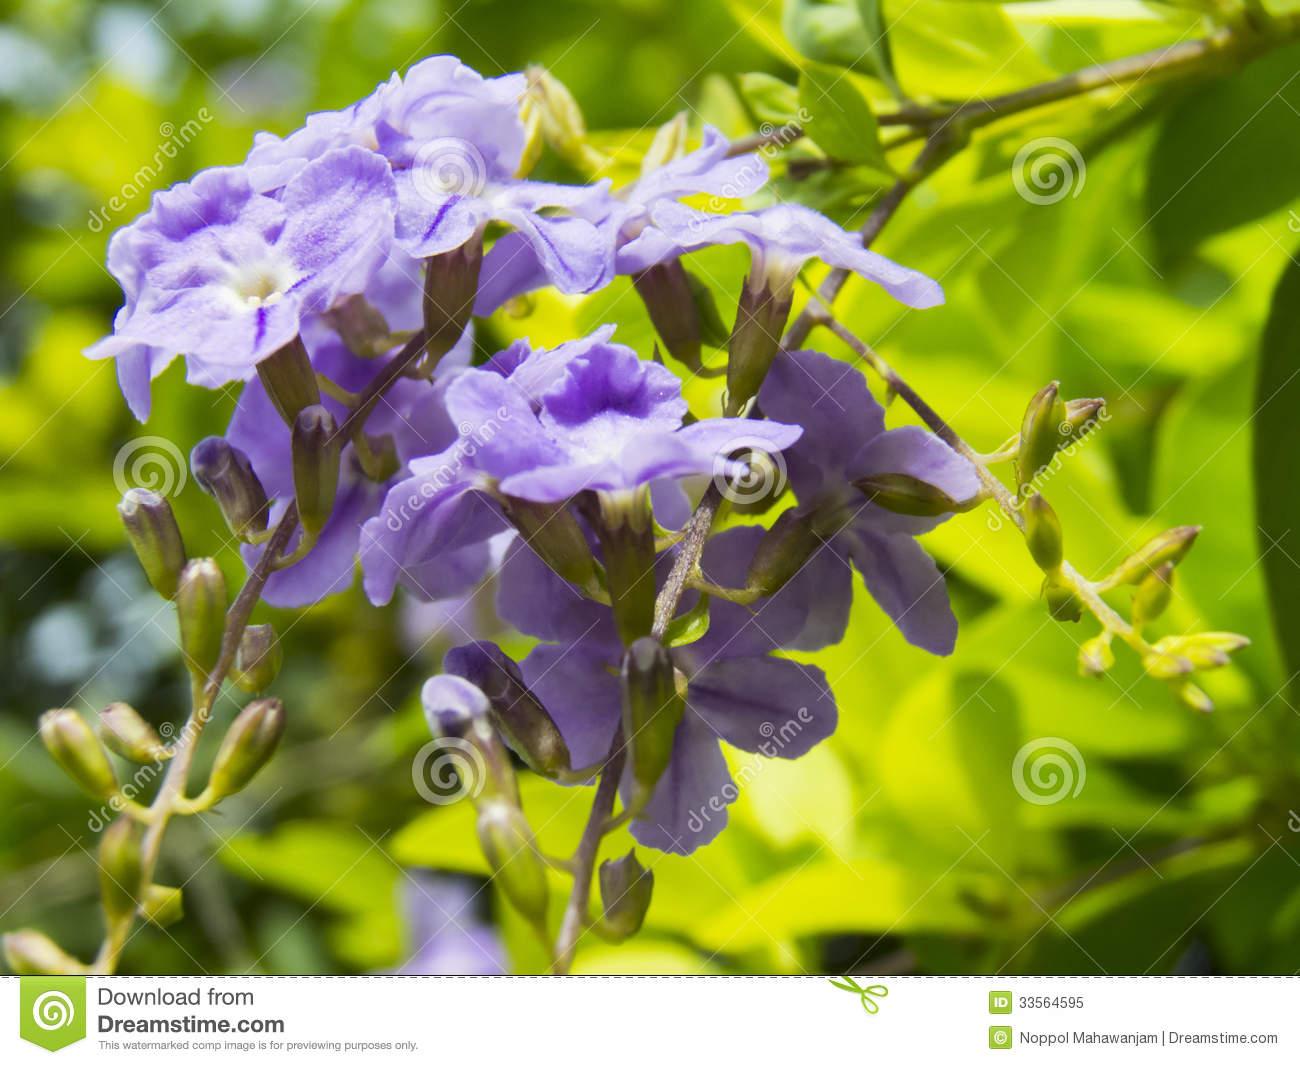 Duranta Erecta Or Golden Dewdrop Flowers. Royalty Free Stock Photo.